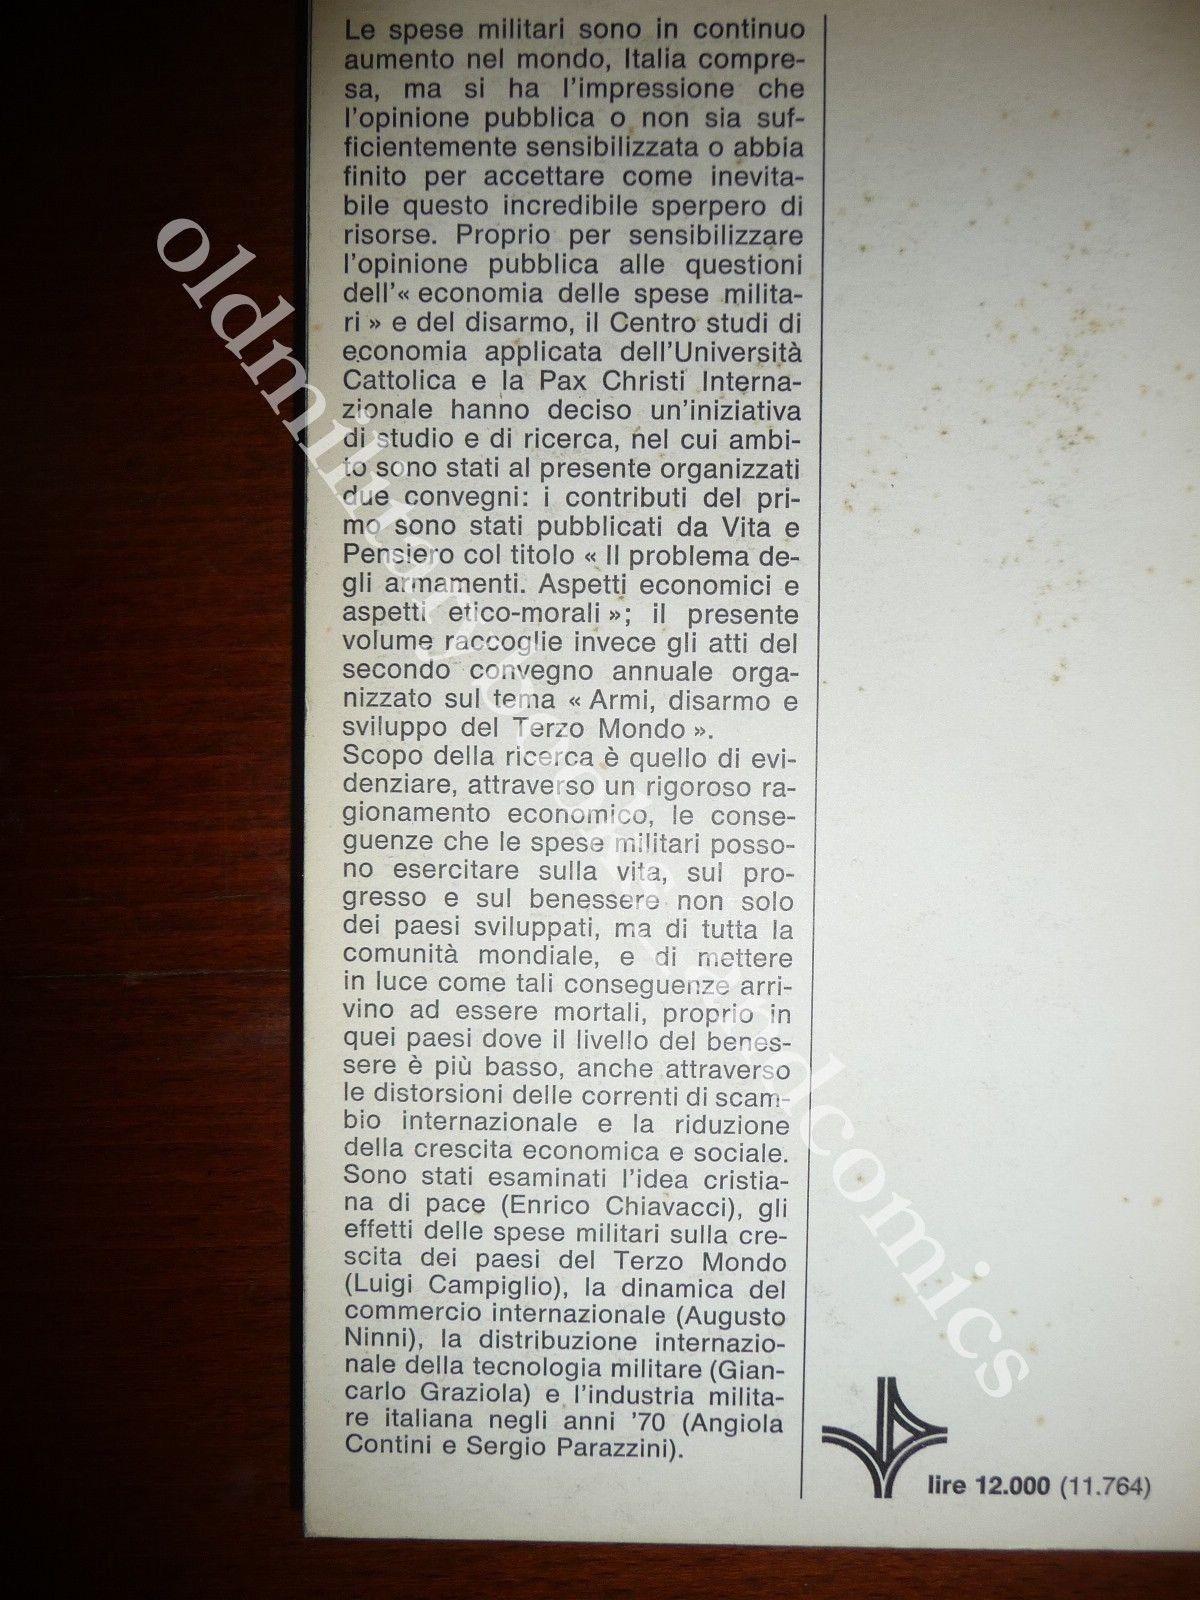 SPESE MILITARI TECNOLOGIA E RAPPORTI NORD-SUD CONSEGUENZE SPESE MILITARI SU VITA